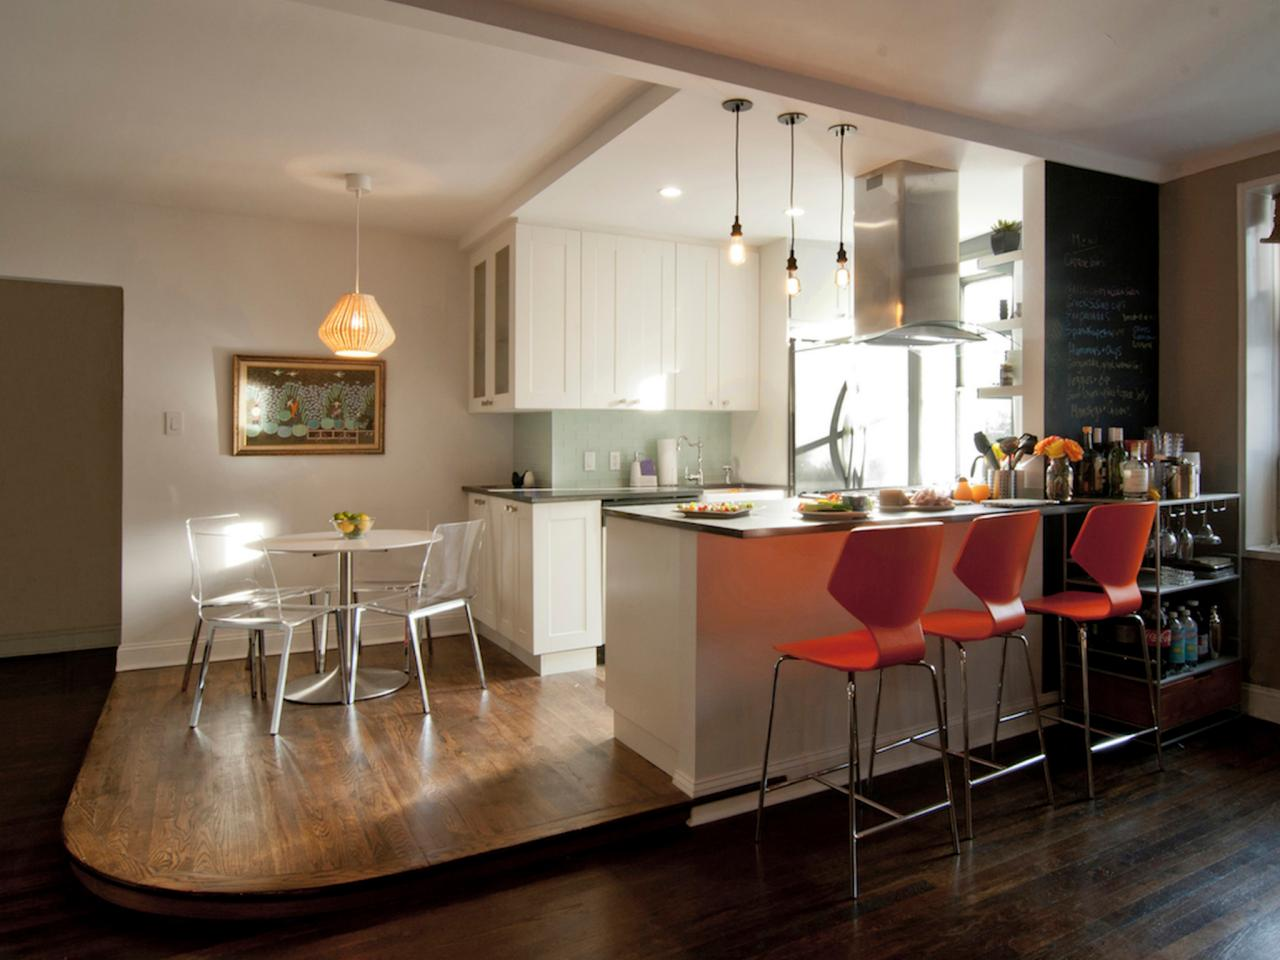 Gorgeous Galley Kitchens To Inspire You HGTVs Decorating - Galley kitchen design photos